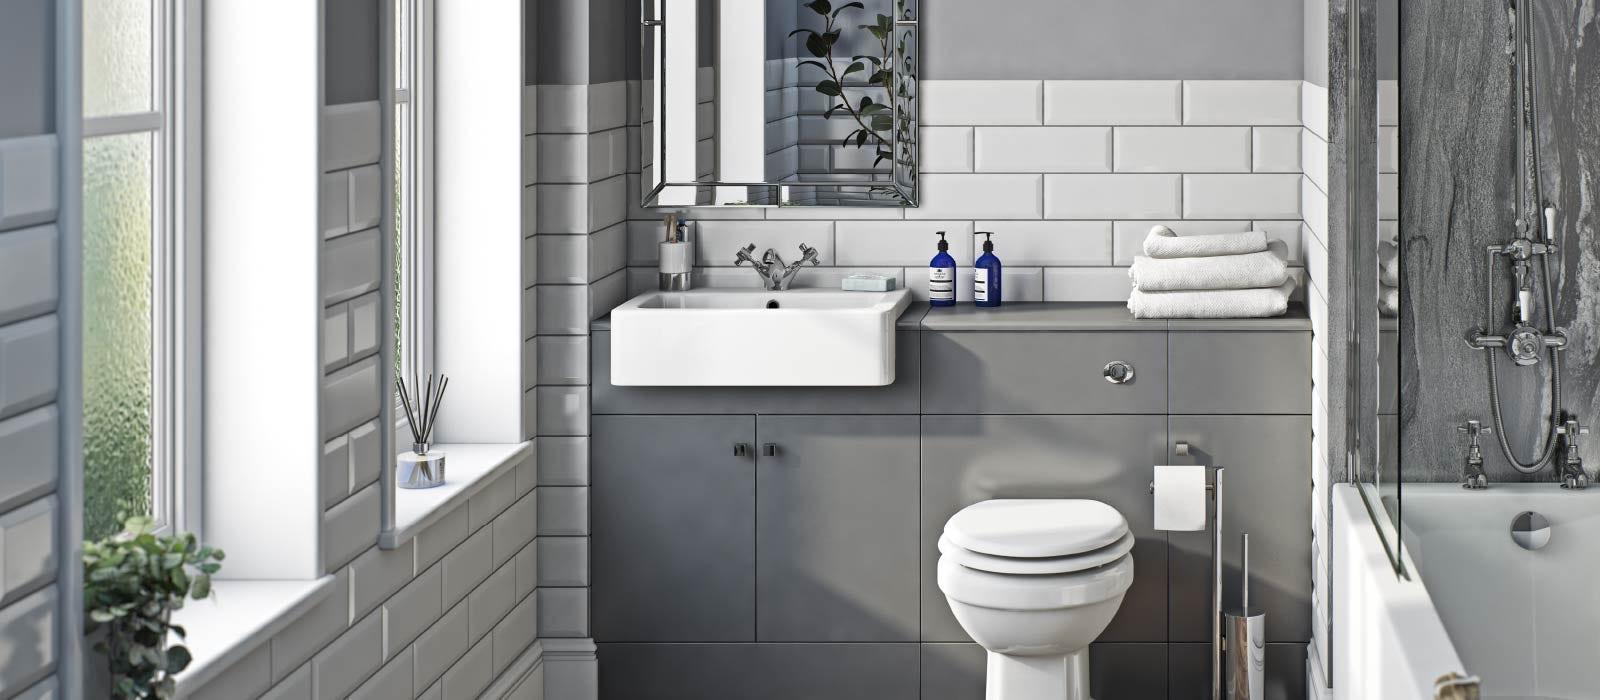 5 stylish bathroom furniture ideas for 2021 | VictoriaPlum.com